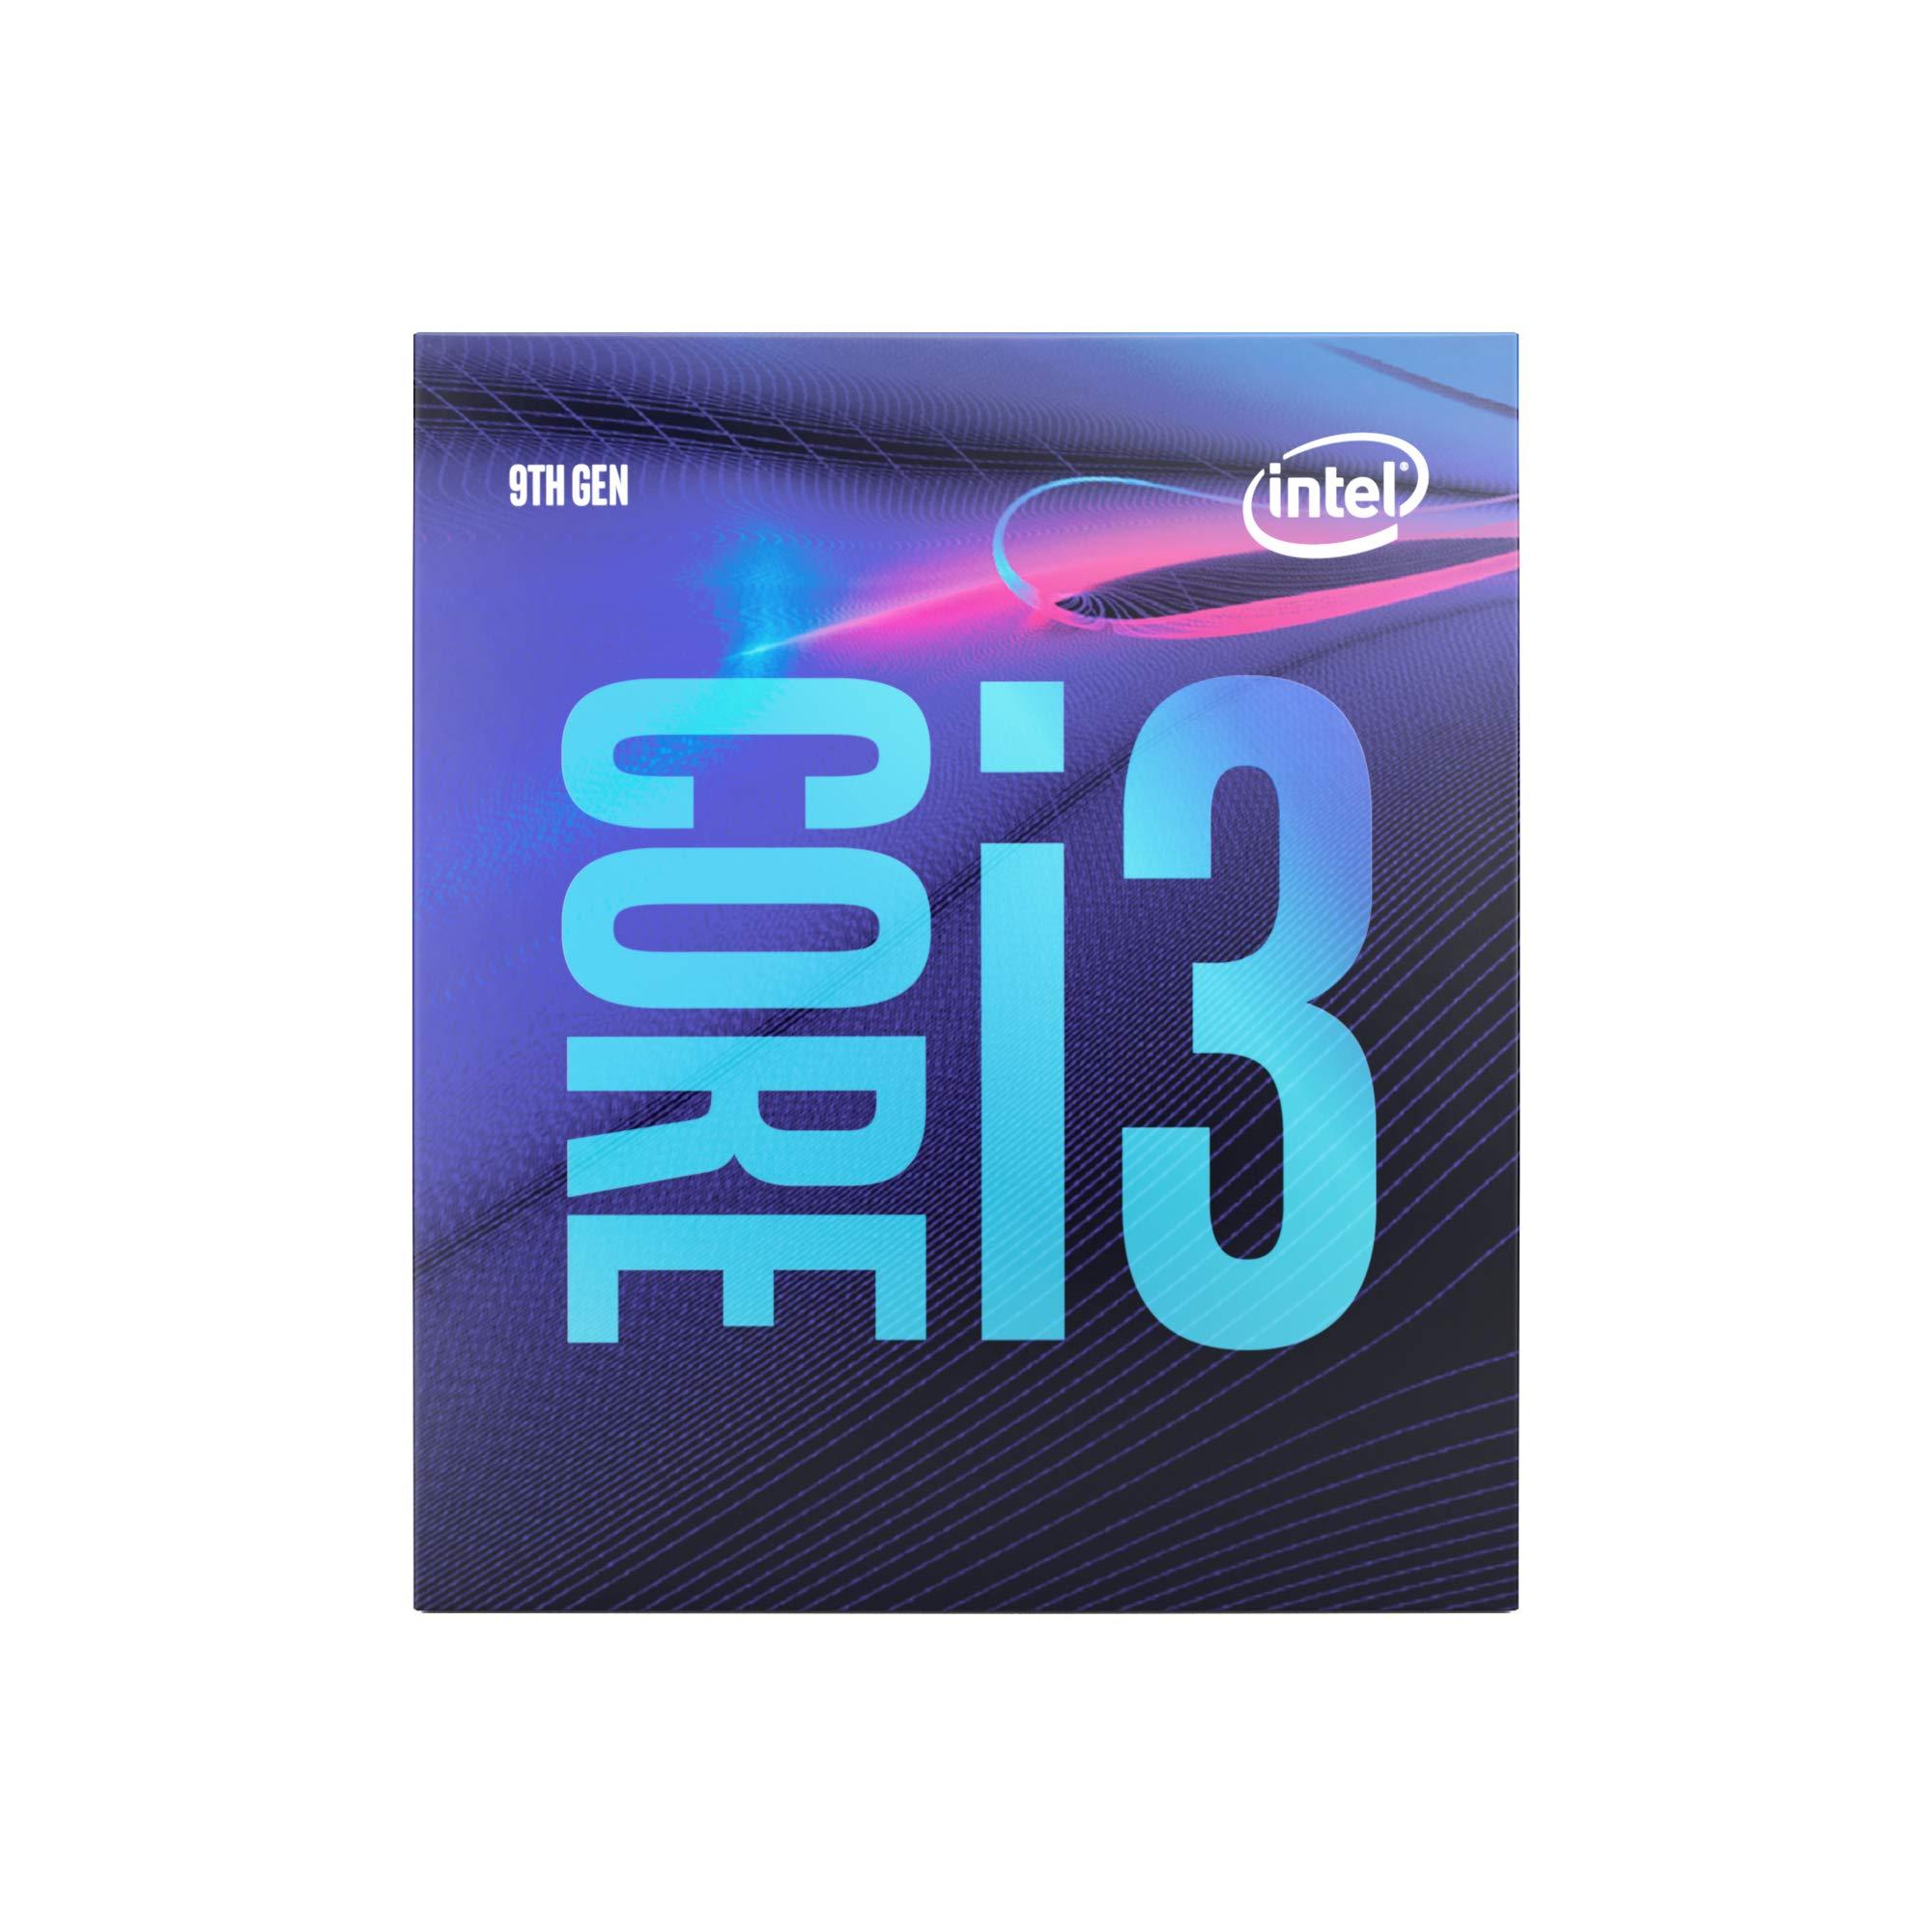 Intel Core i3-9100 Desktop Processor 4 Cores up to 4.2 GHz LGA1151 300 Series 65W